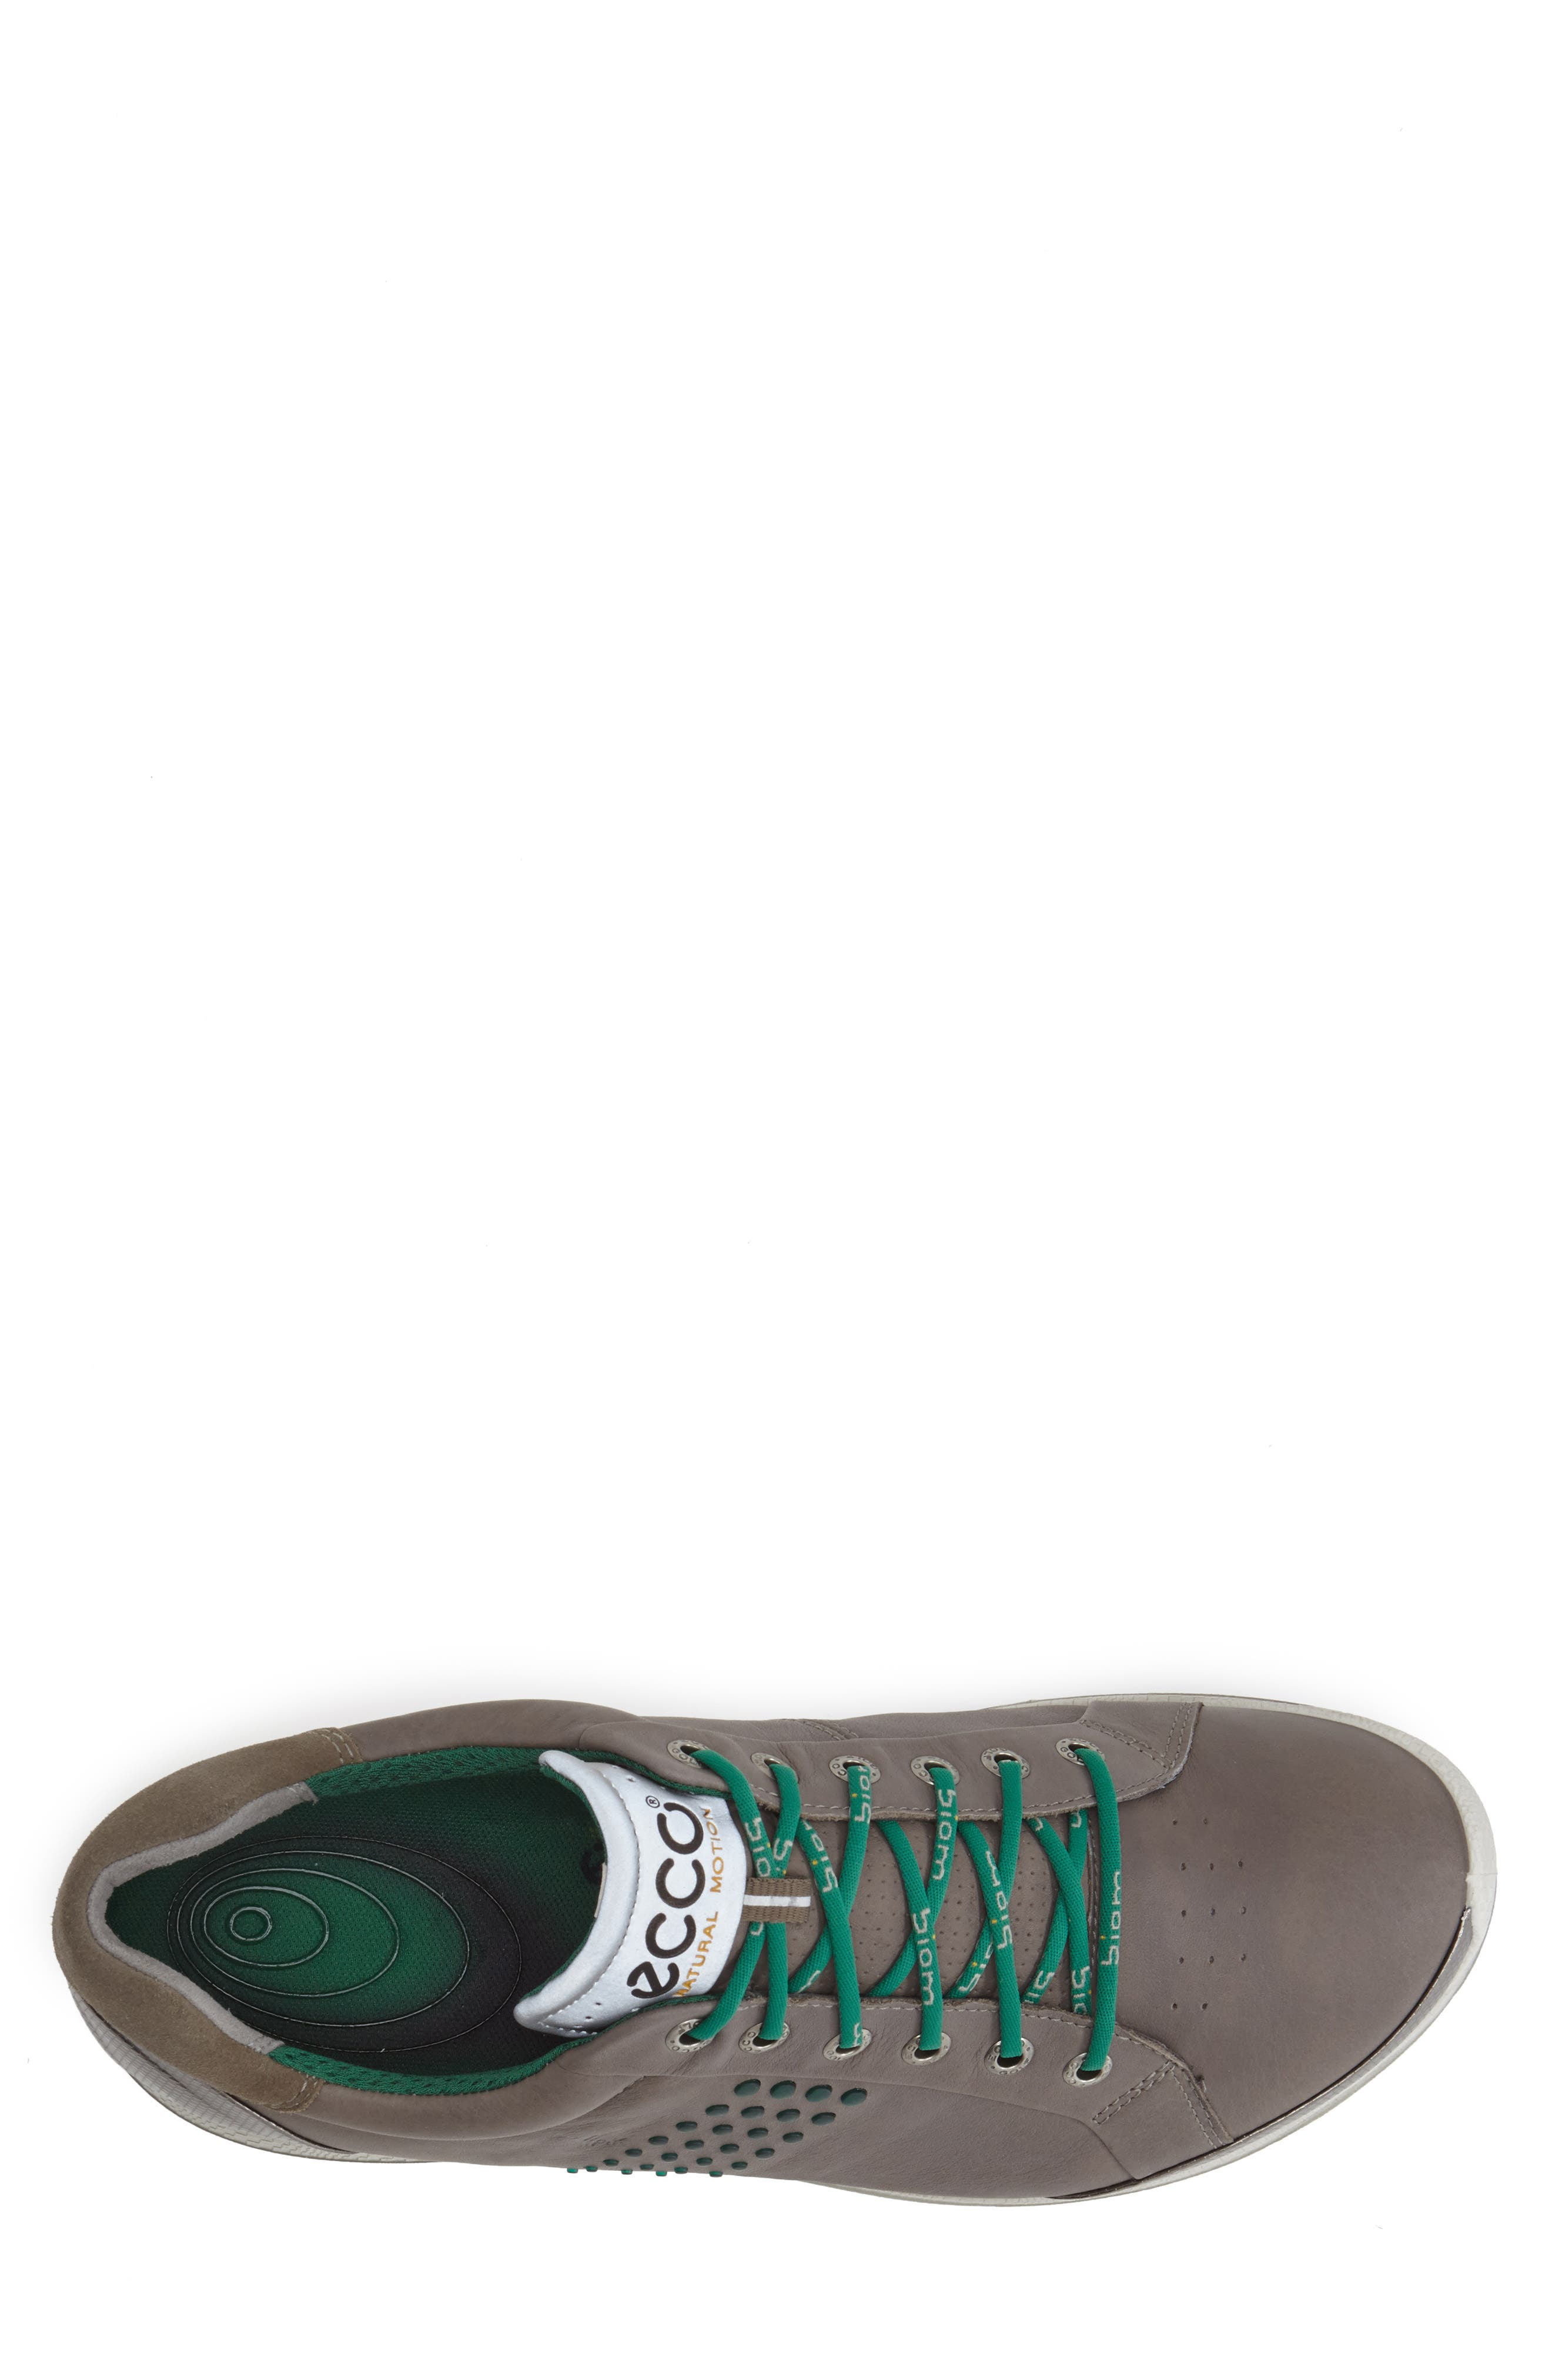 BIOM Hybrid 2 Golf Shoe,                             Alternate thumbnail 3, color,                             WARM GREY/ GREEN